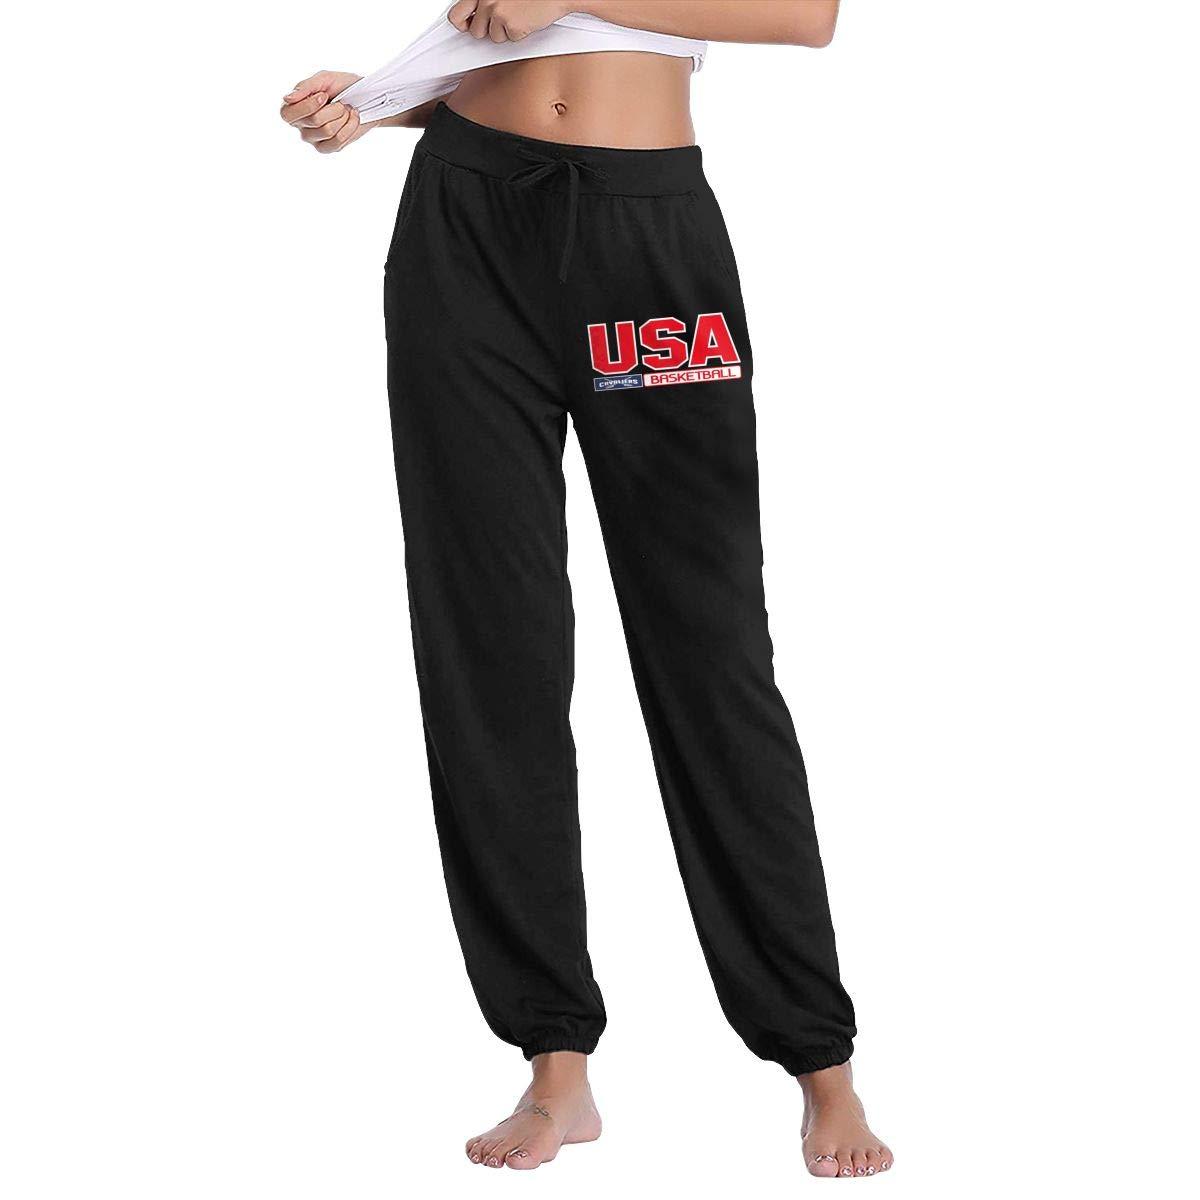 Black L GavDon Women's Cleveland CavaliersNavyTeamUSA Casual Sweatpants Yoga Jogger Lounge Sweat Pants with Pockets